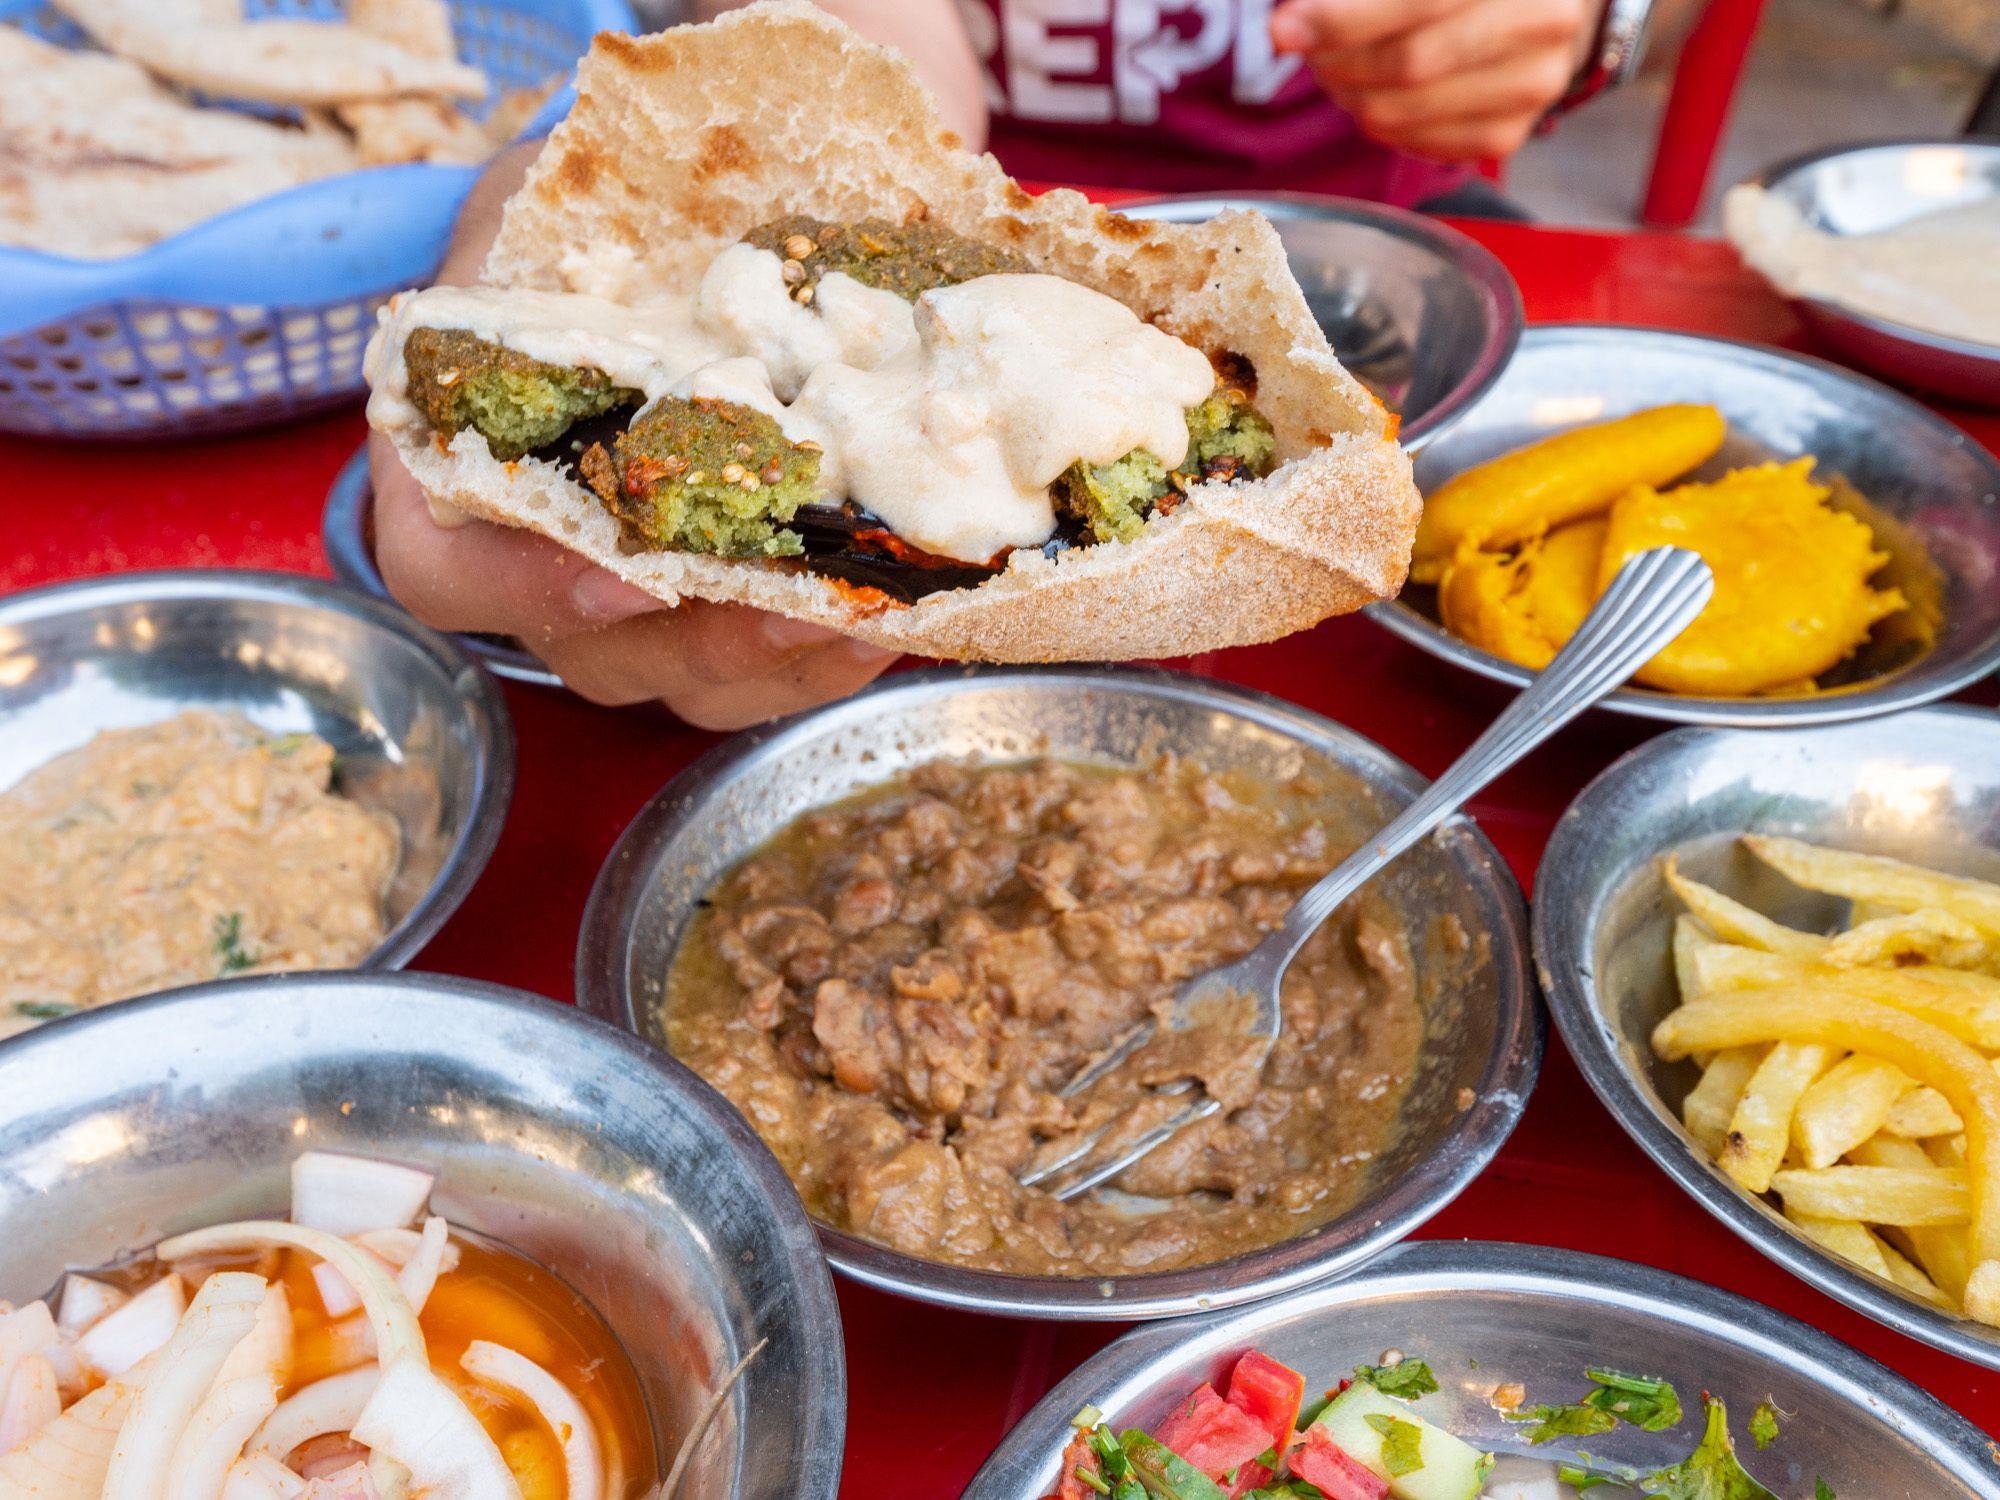 Egyptian cuisine foul fava bean dip in Cairo, Egypt